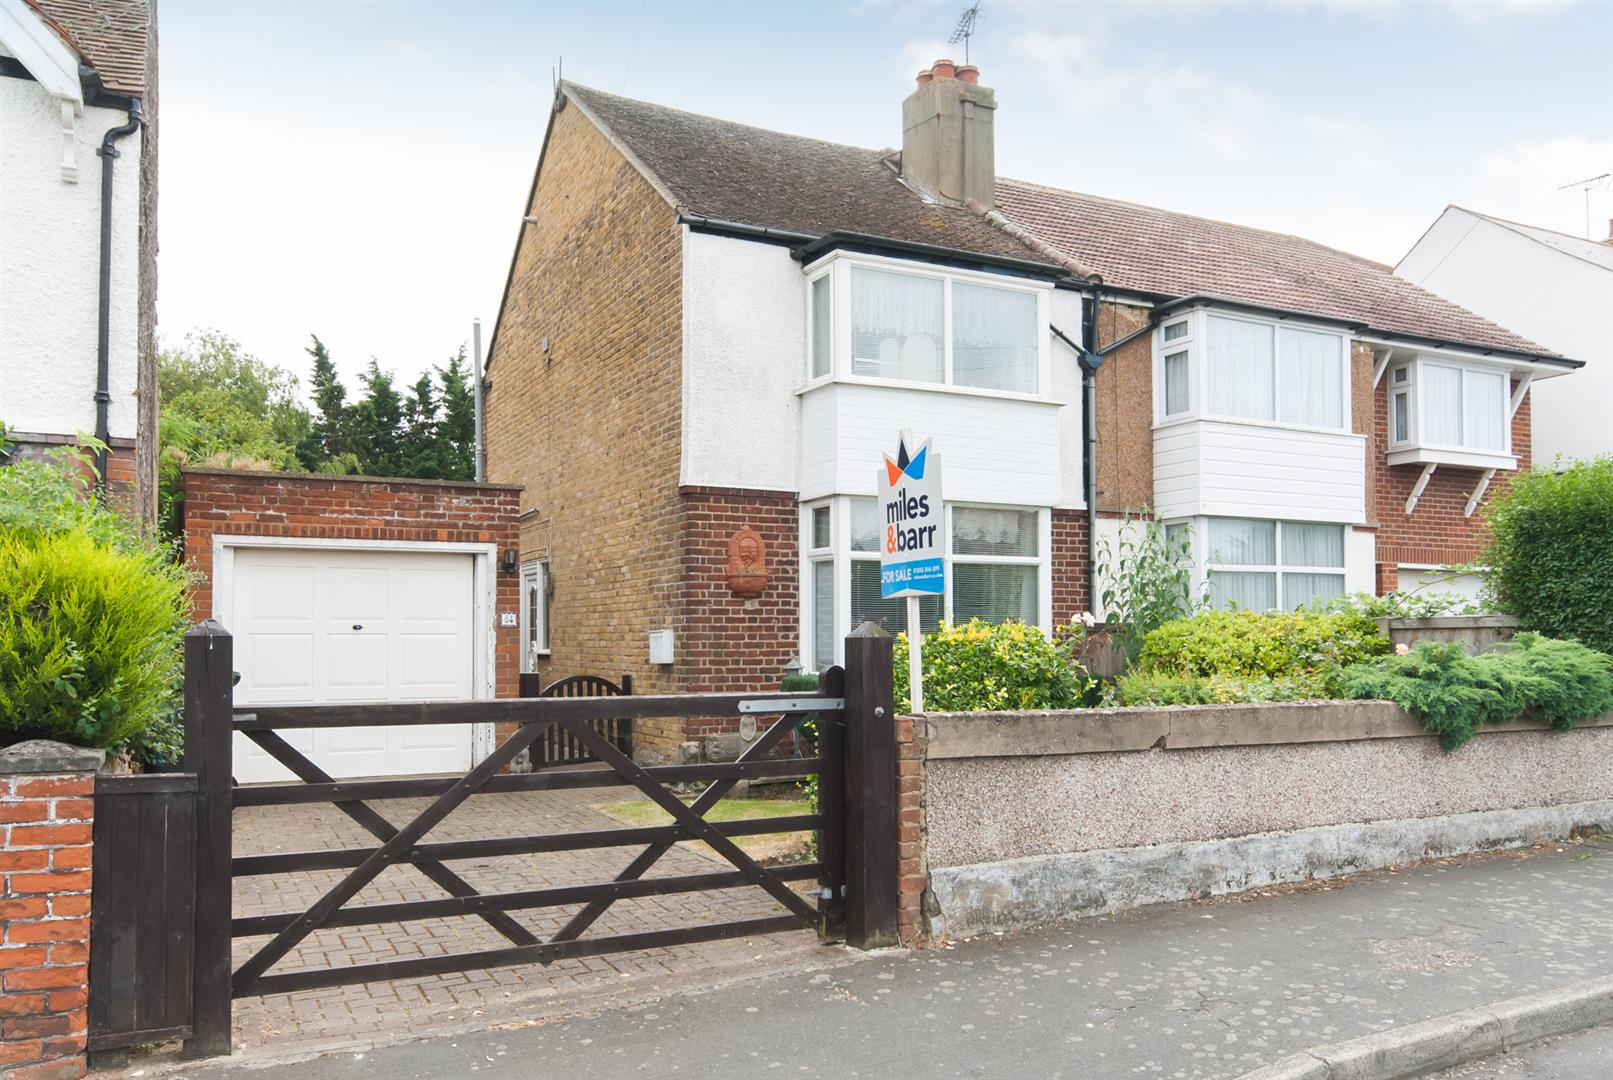 2 Bedrooms House for sale in Cross Road, Birchington